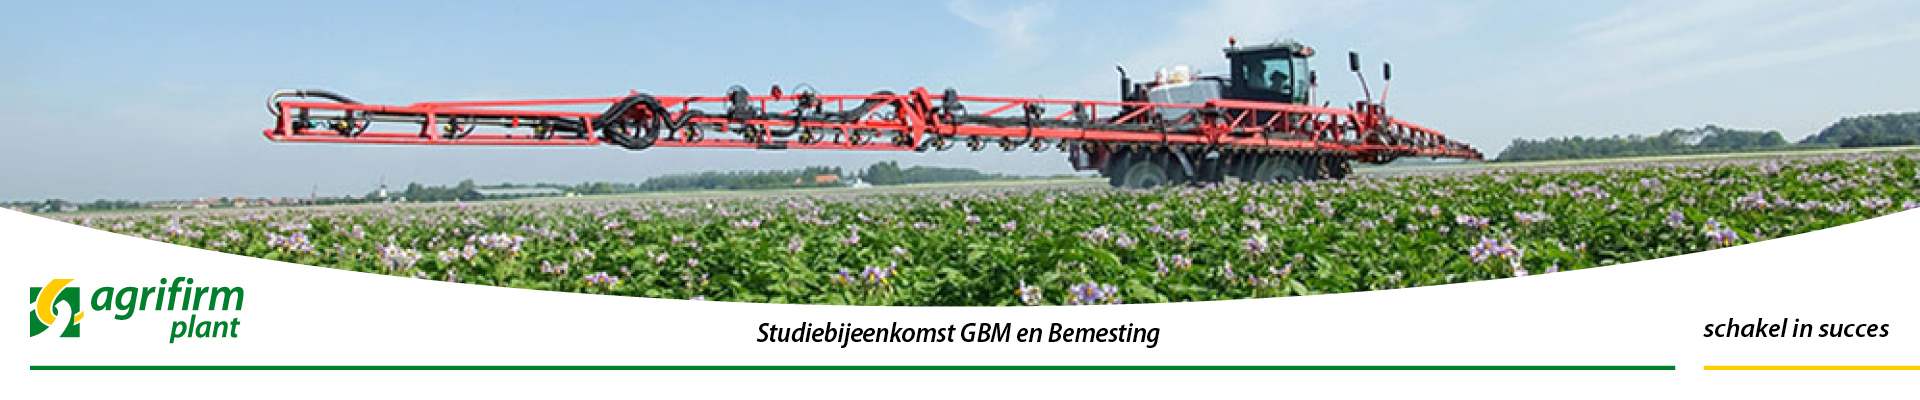 Studiebijeenkomst GBM en Bemesting in regio Zuid